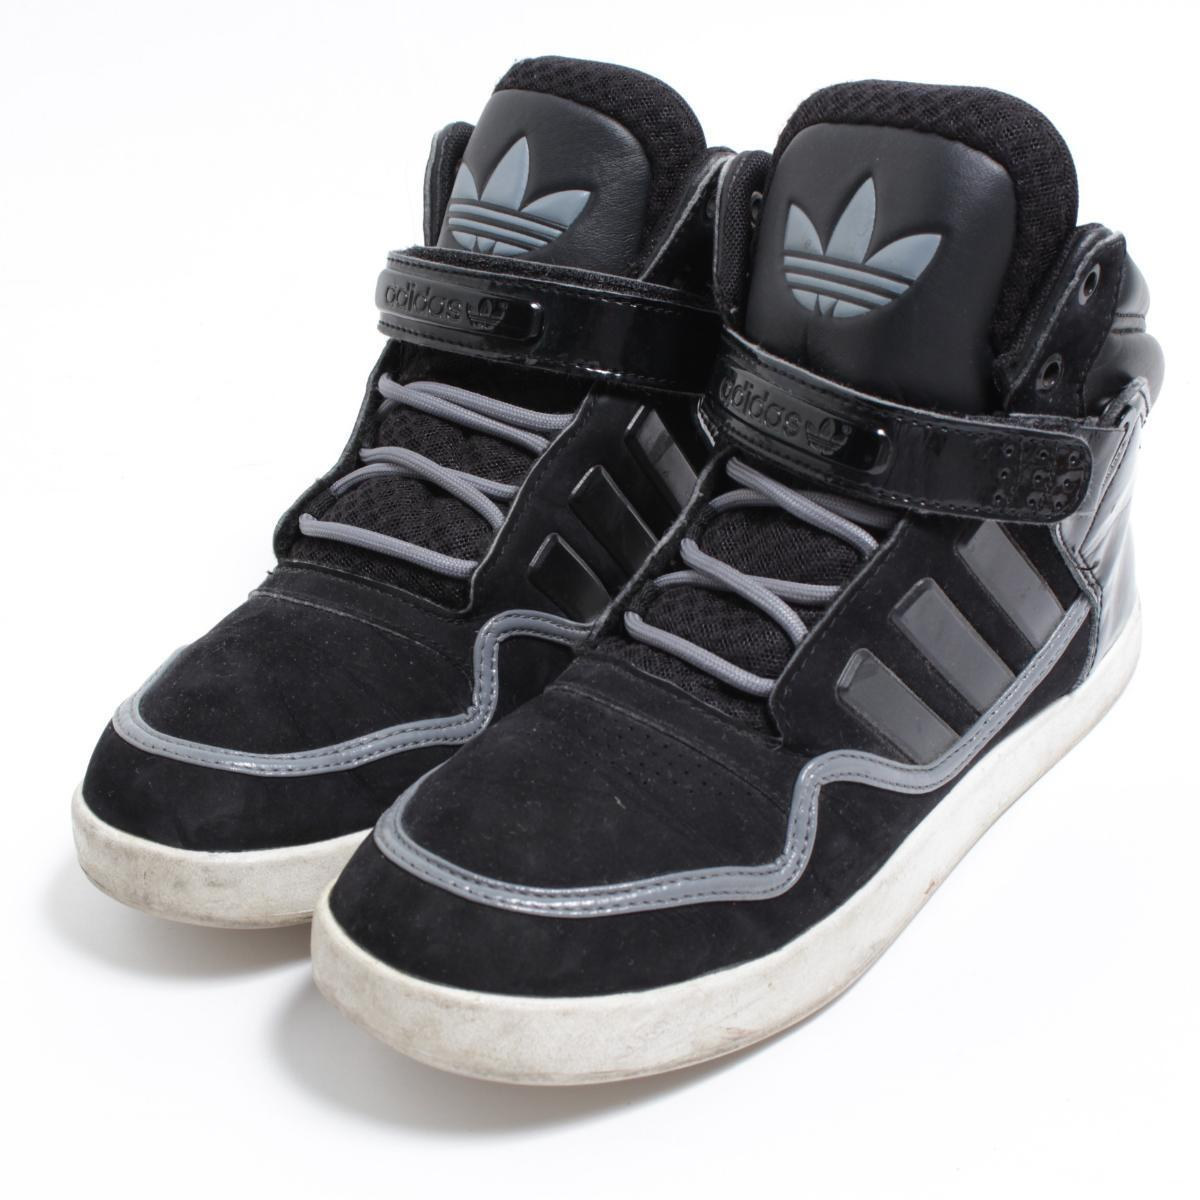 VINTAGE CLOTHING JAM  Adidas adidas AR 2.0 sneakers US6 .5 men s ... 8ed49f8a02